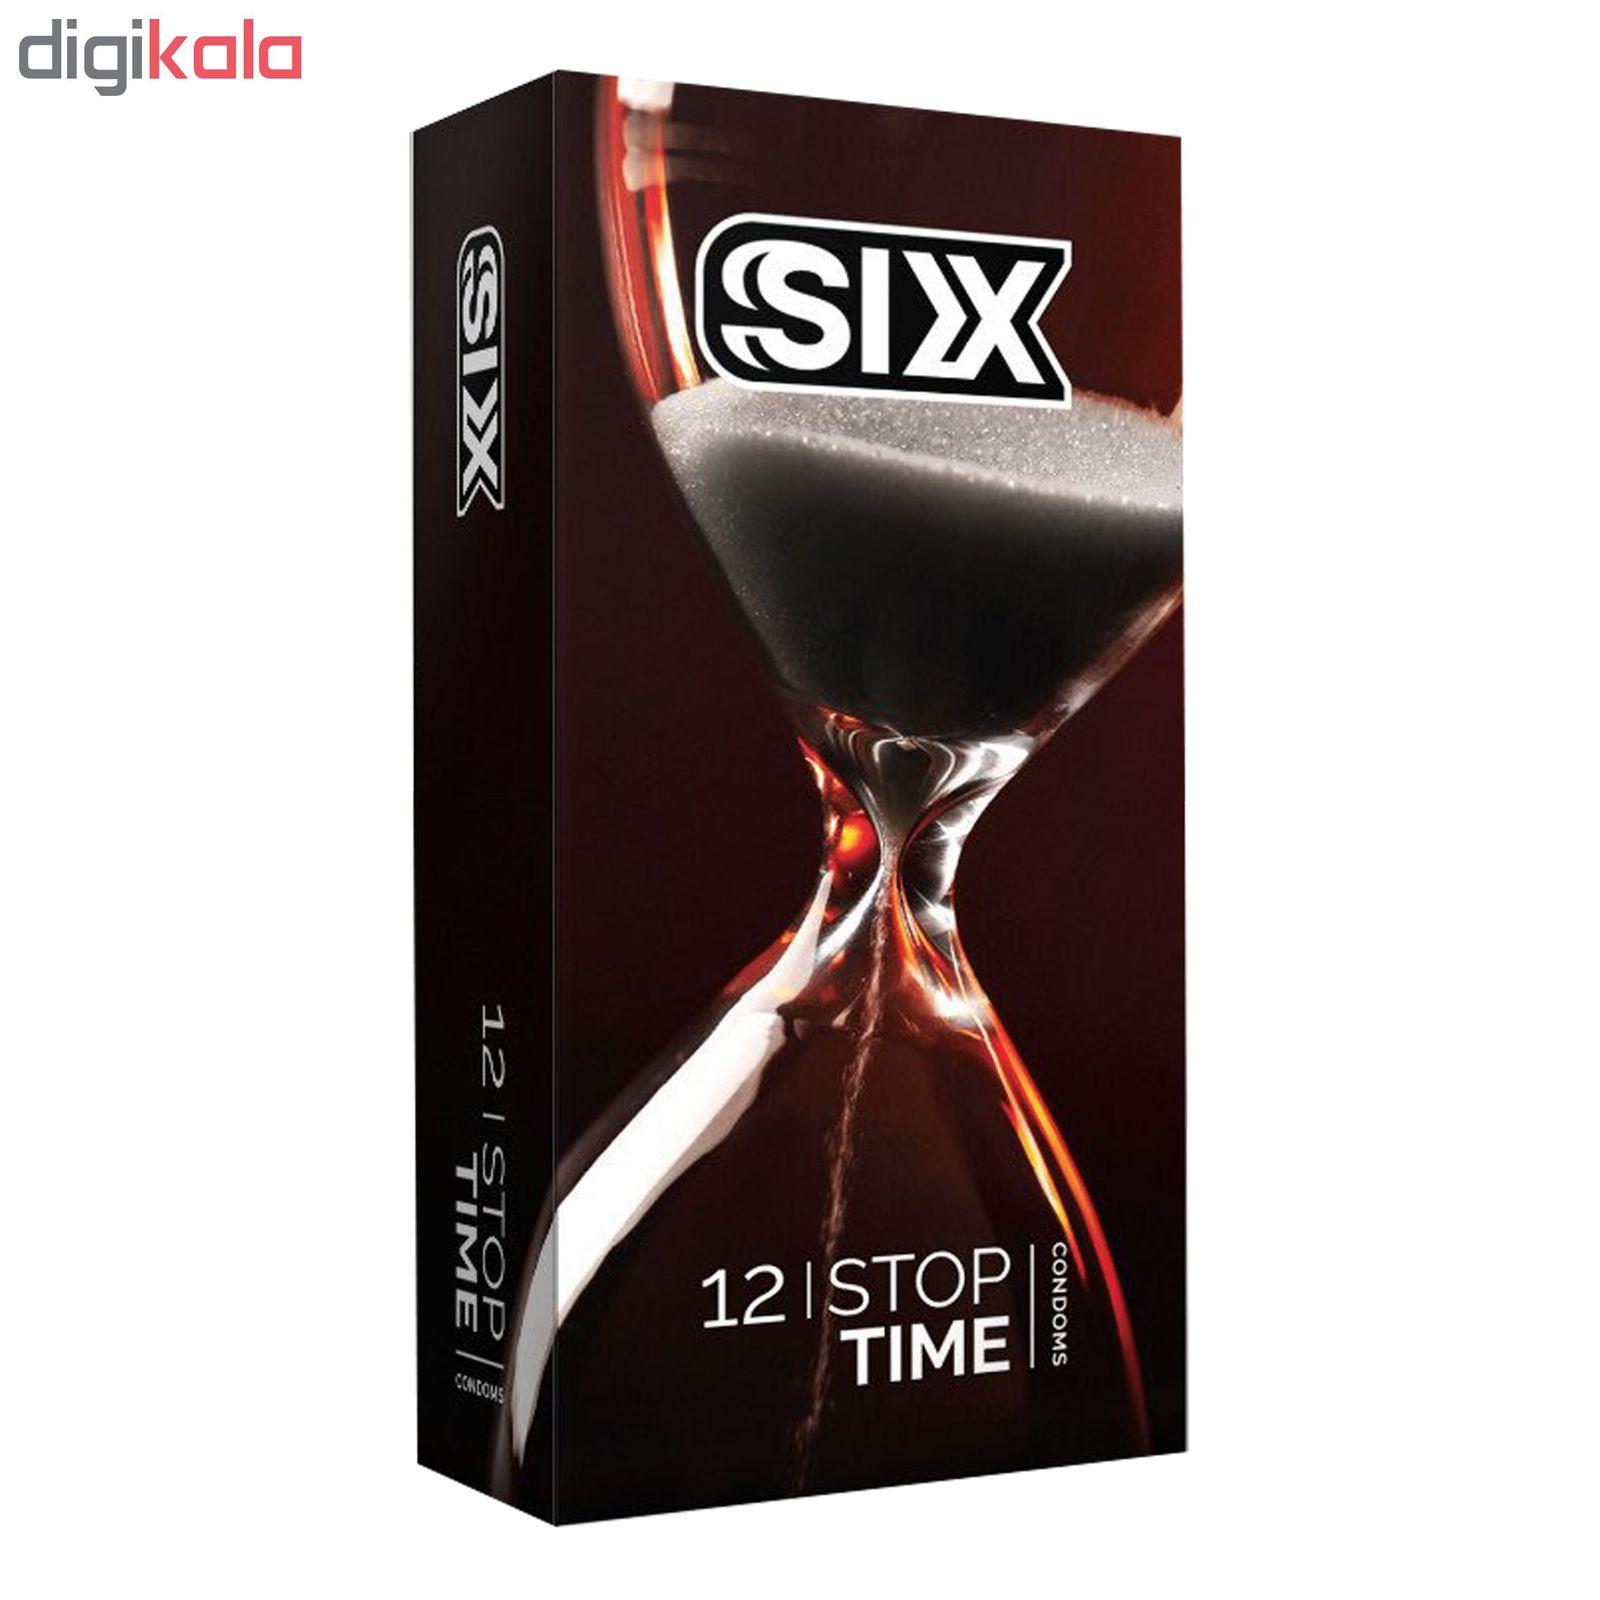 کاندوم سیکس مدل Stop Time بسته 12 عددی main 1 1